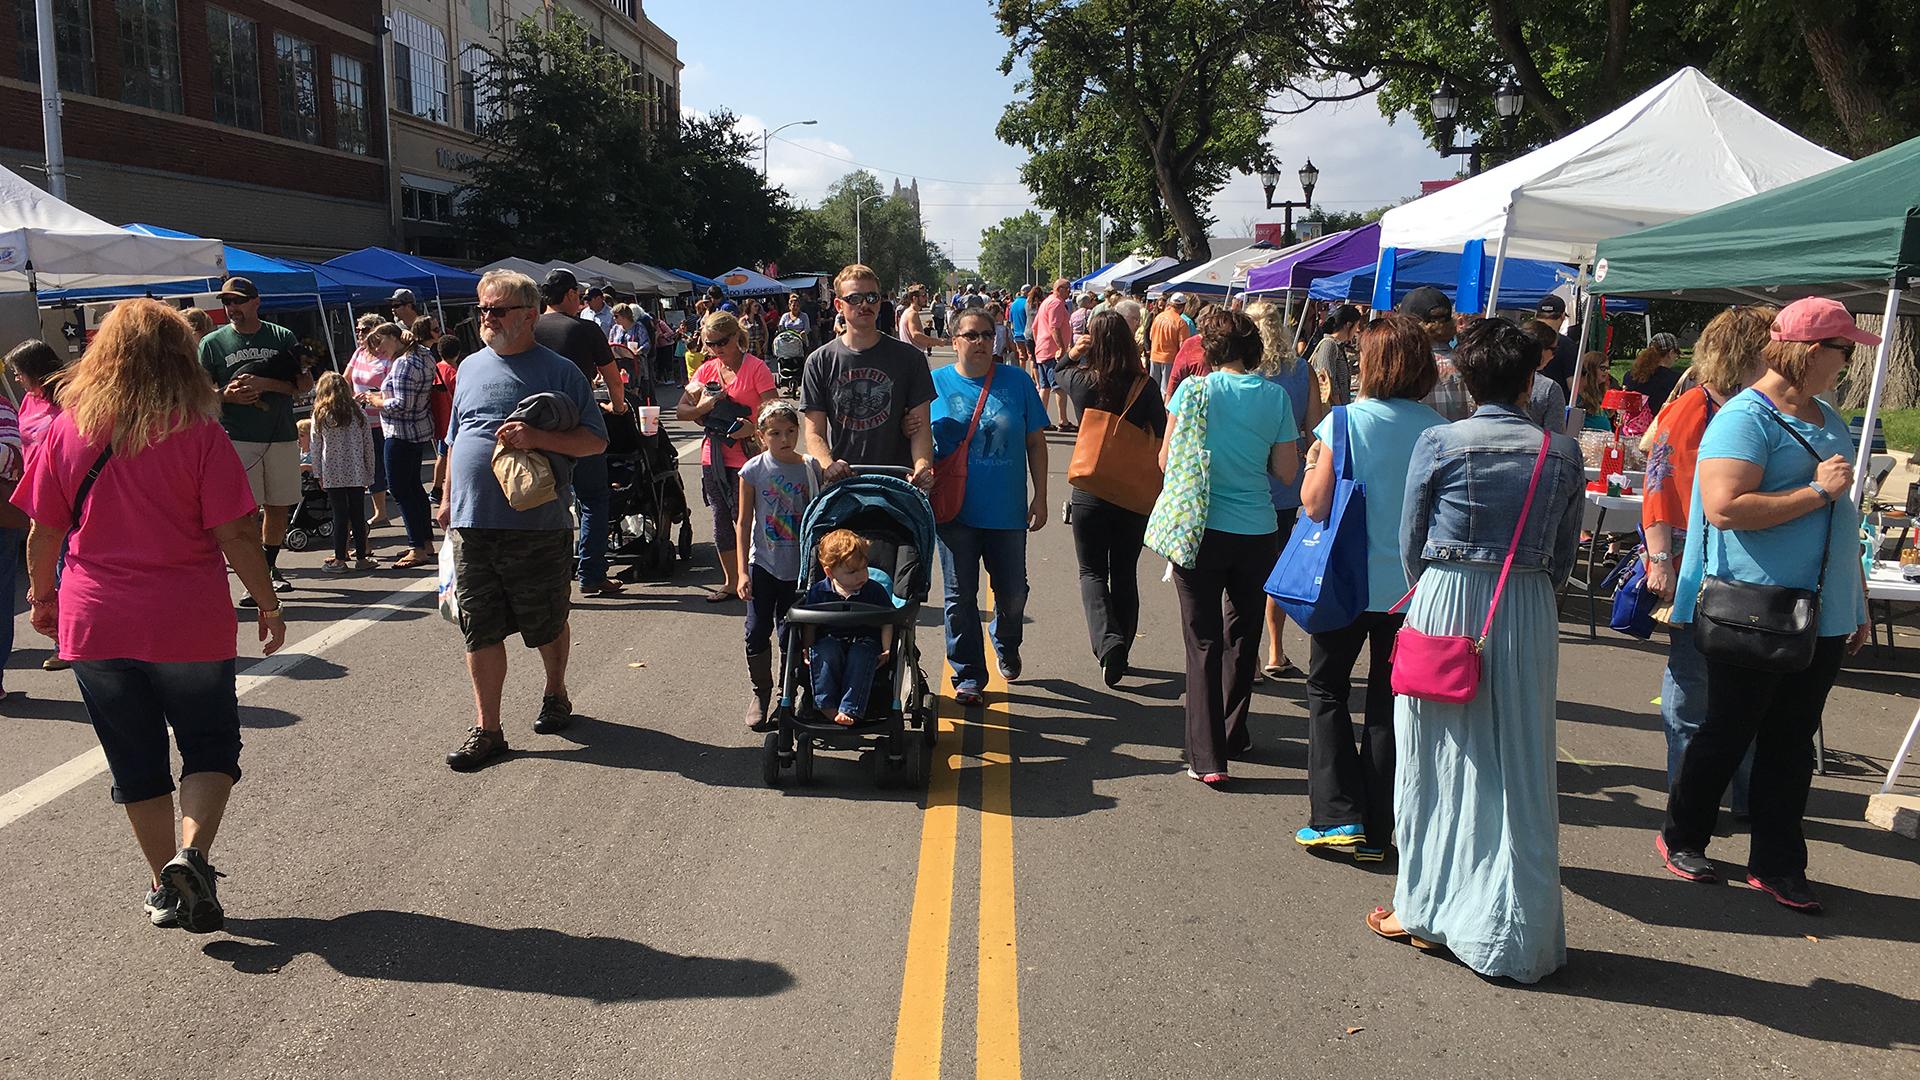 Applications sought for Amarillo Community Market vendors for 2017 season